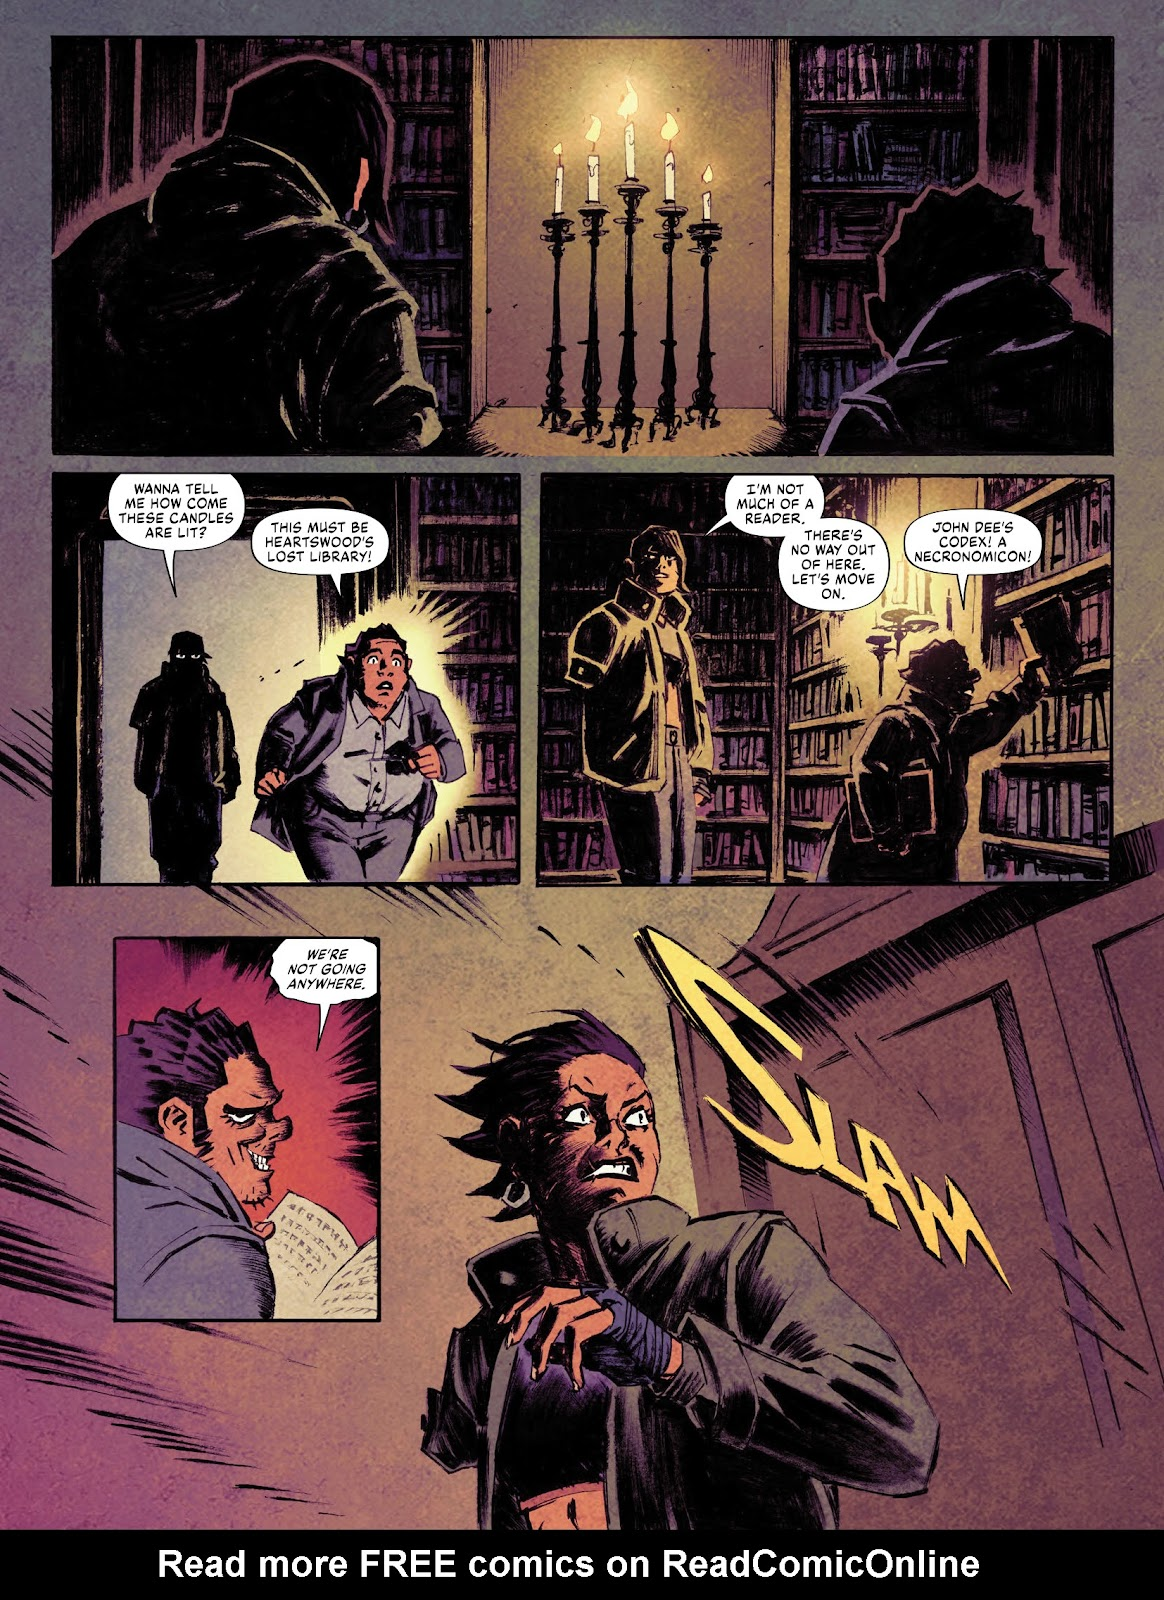 Judge Dredd Megazine (Vol. 5) issue 427 - Page 48